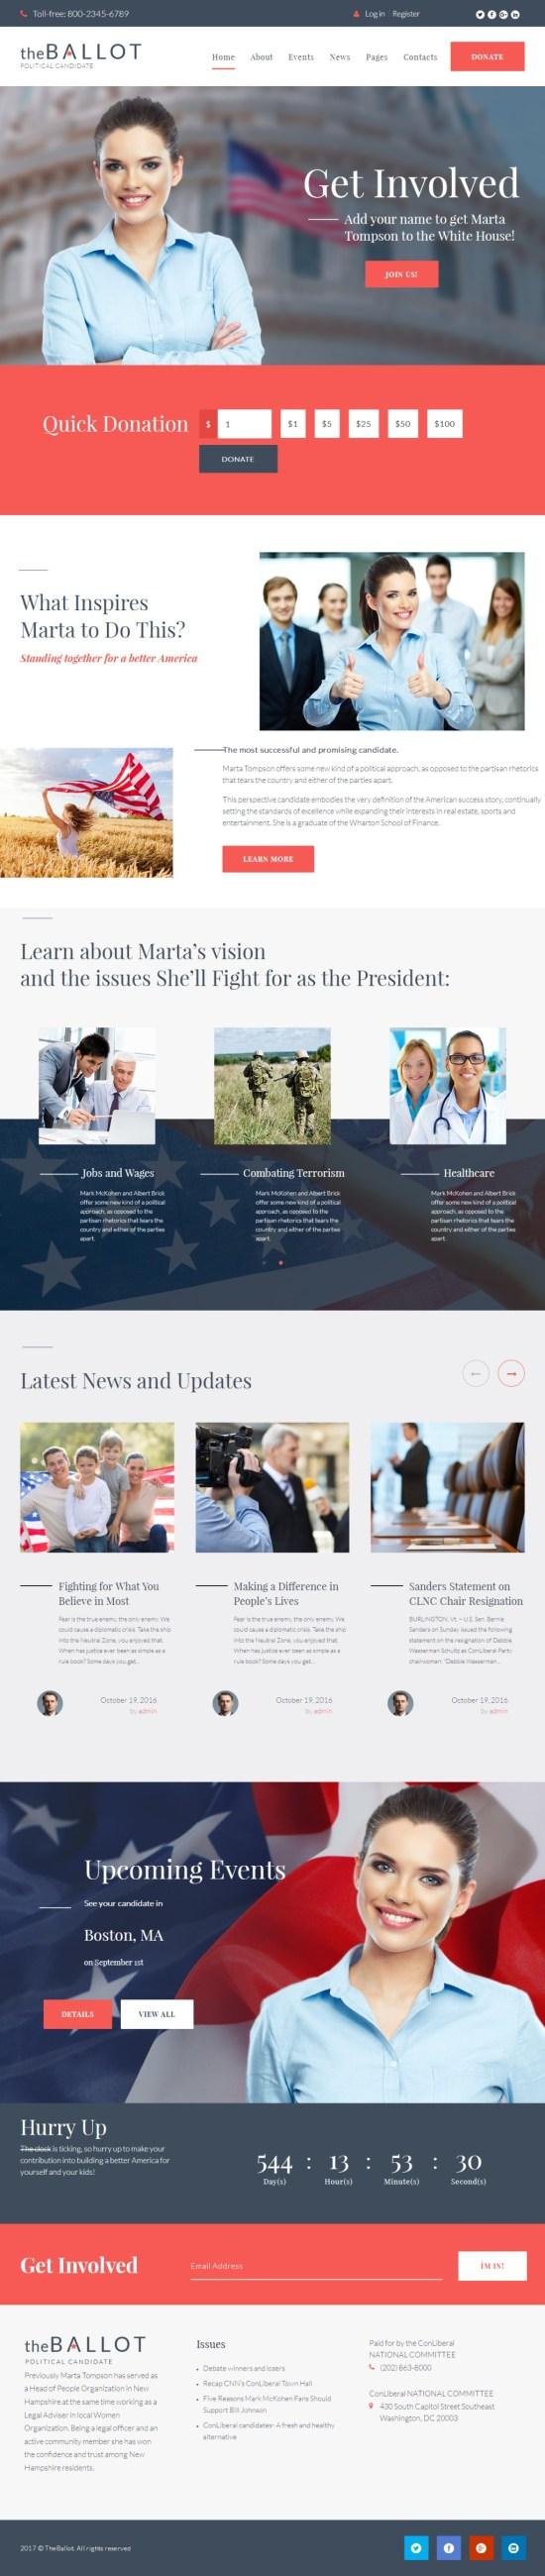 the ballot–political candidate wordpress theme - The Ballot WordPress Theme